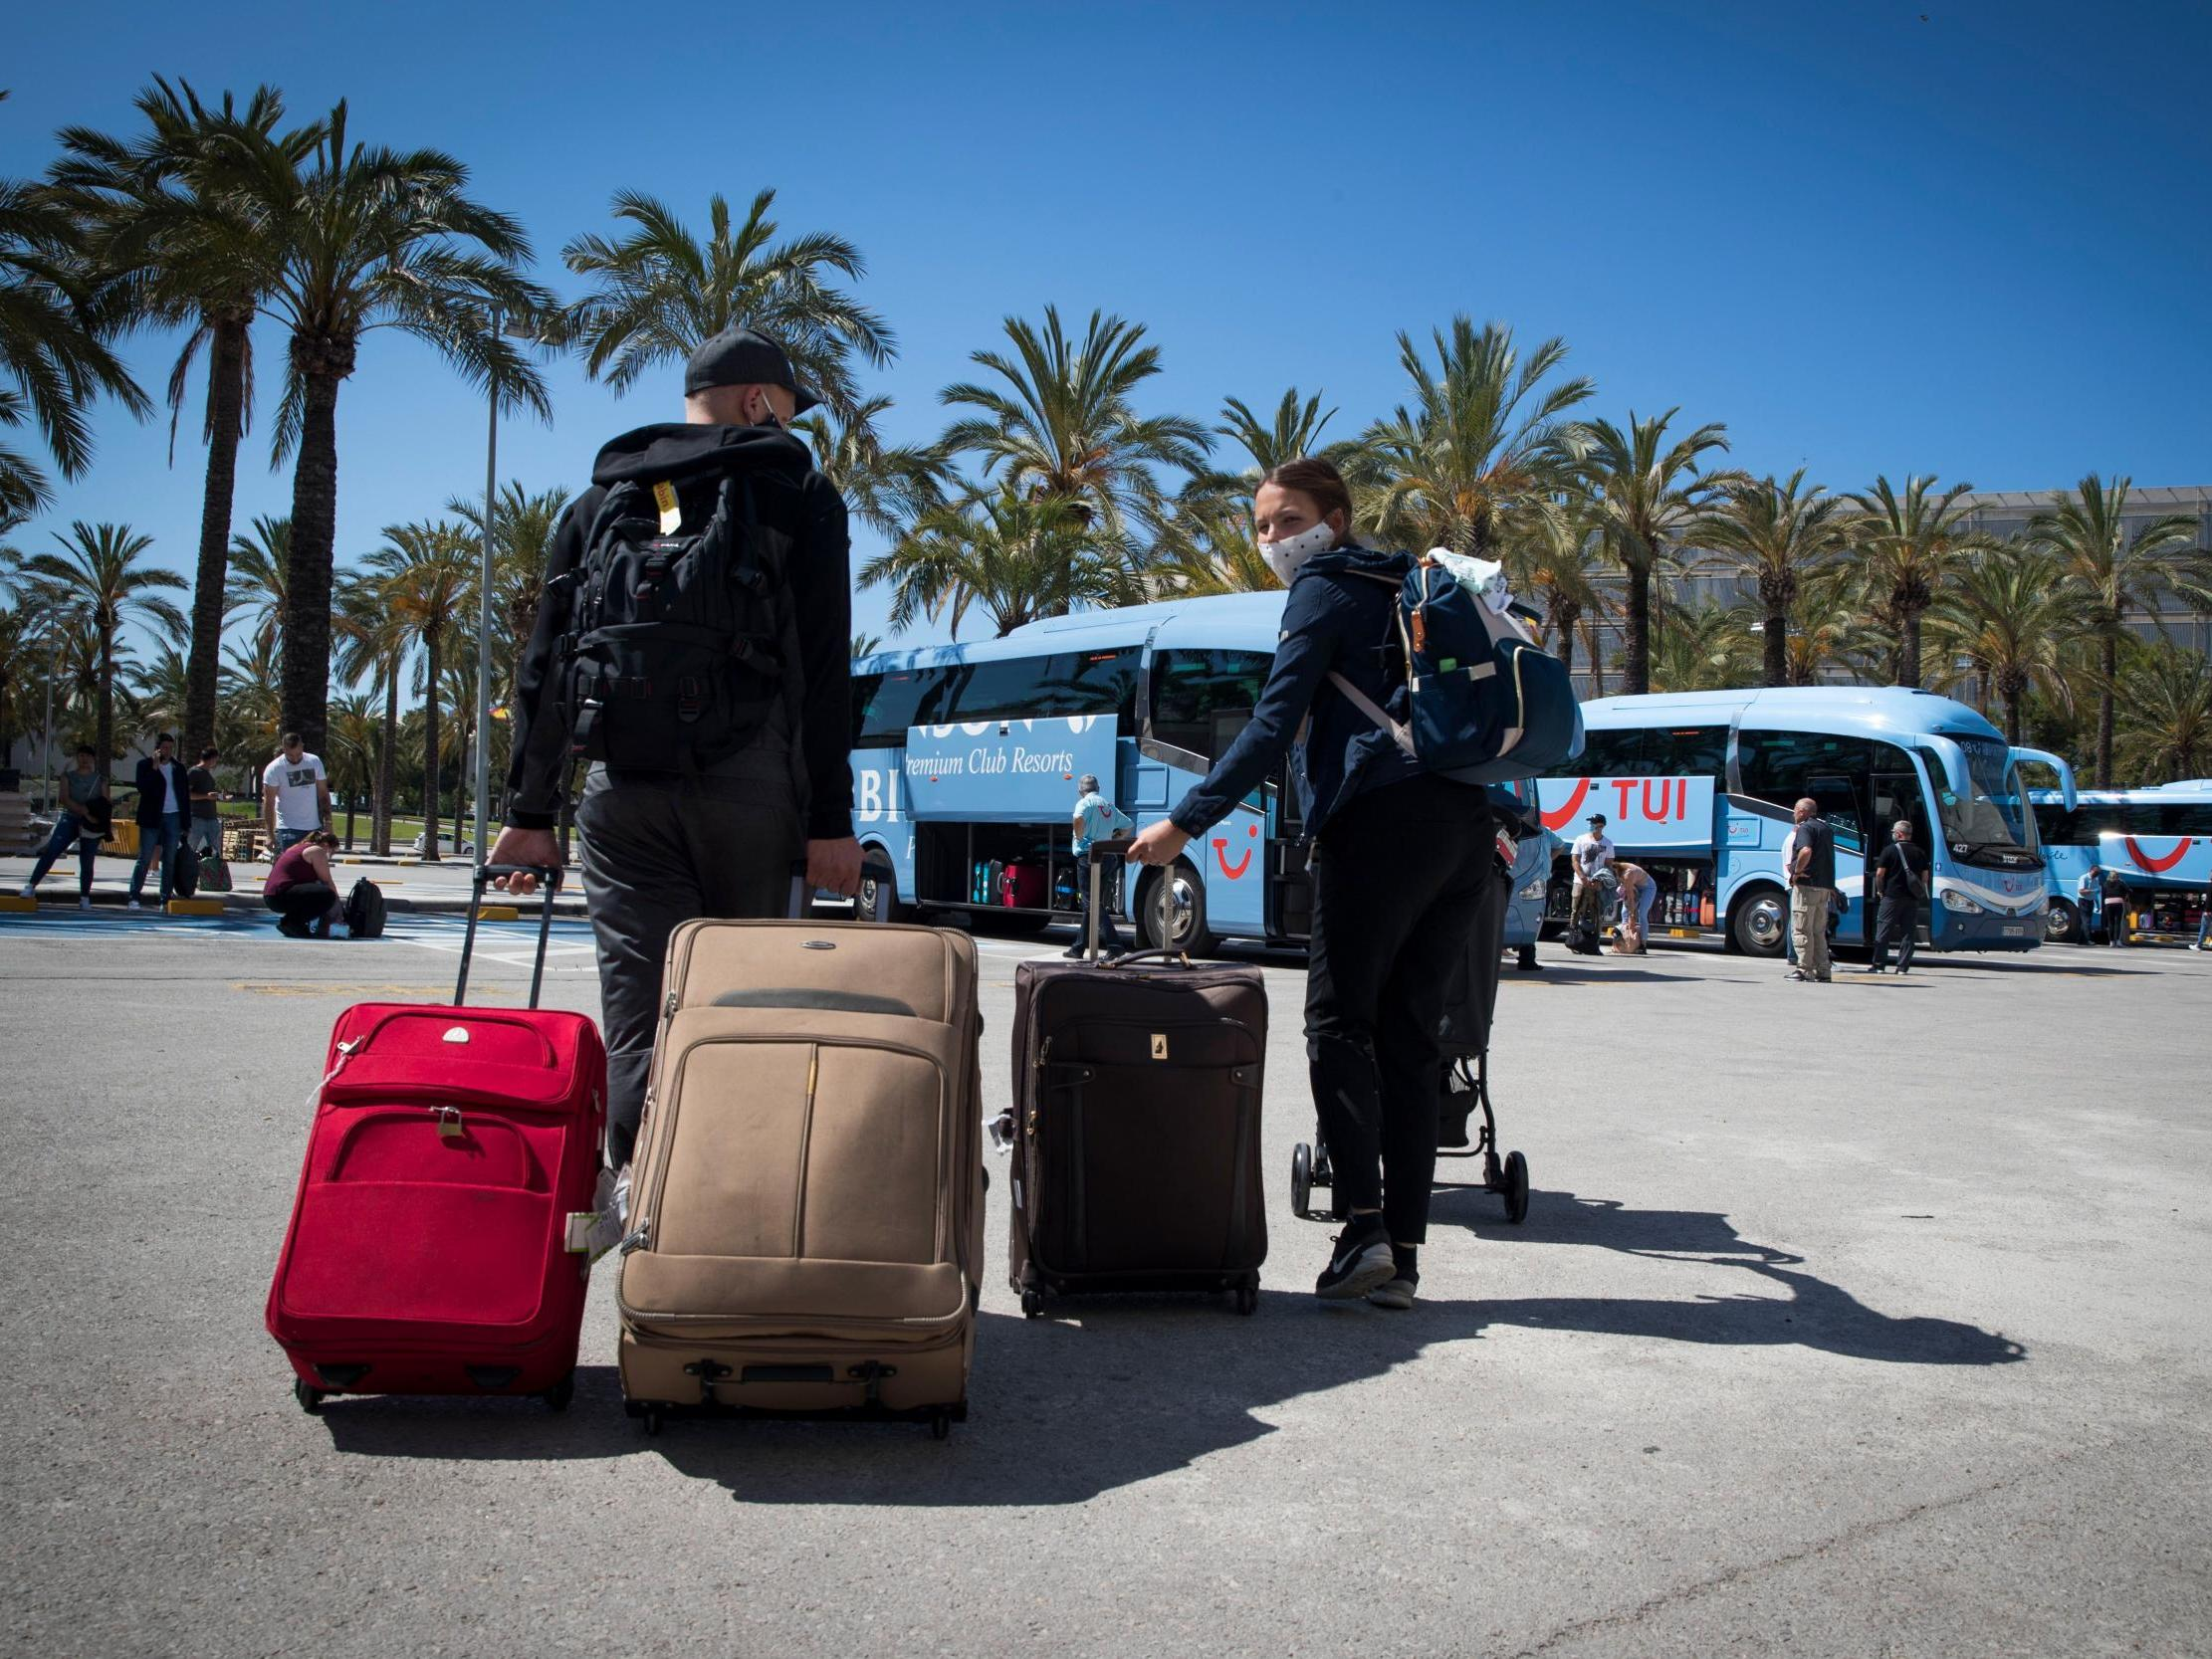 Coronavirus: Europe lifts travel ban for 14 countries but not US thumbnail